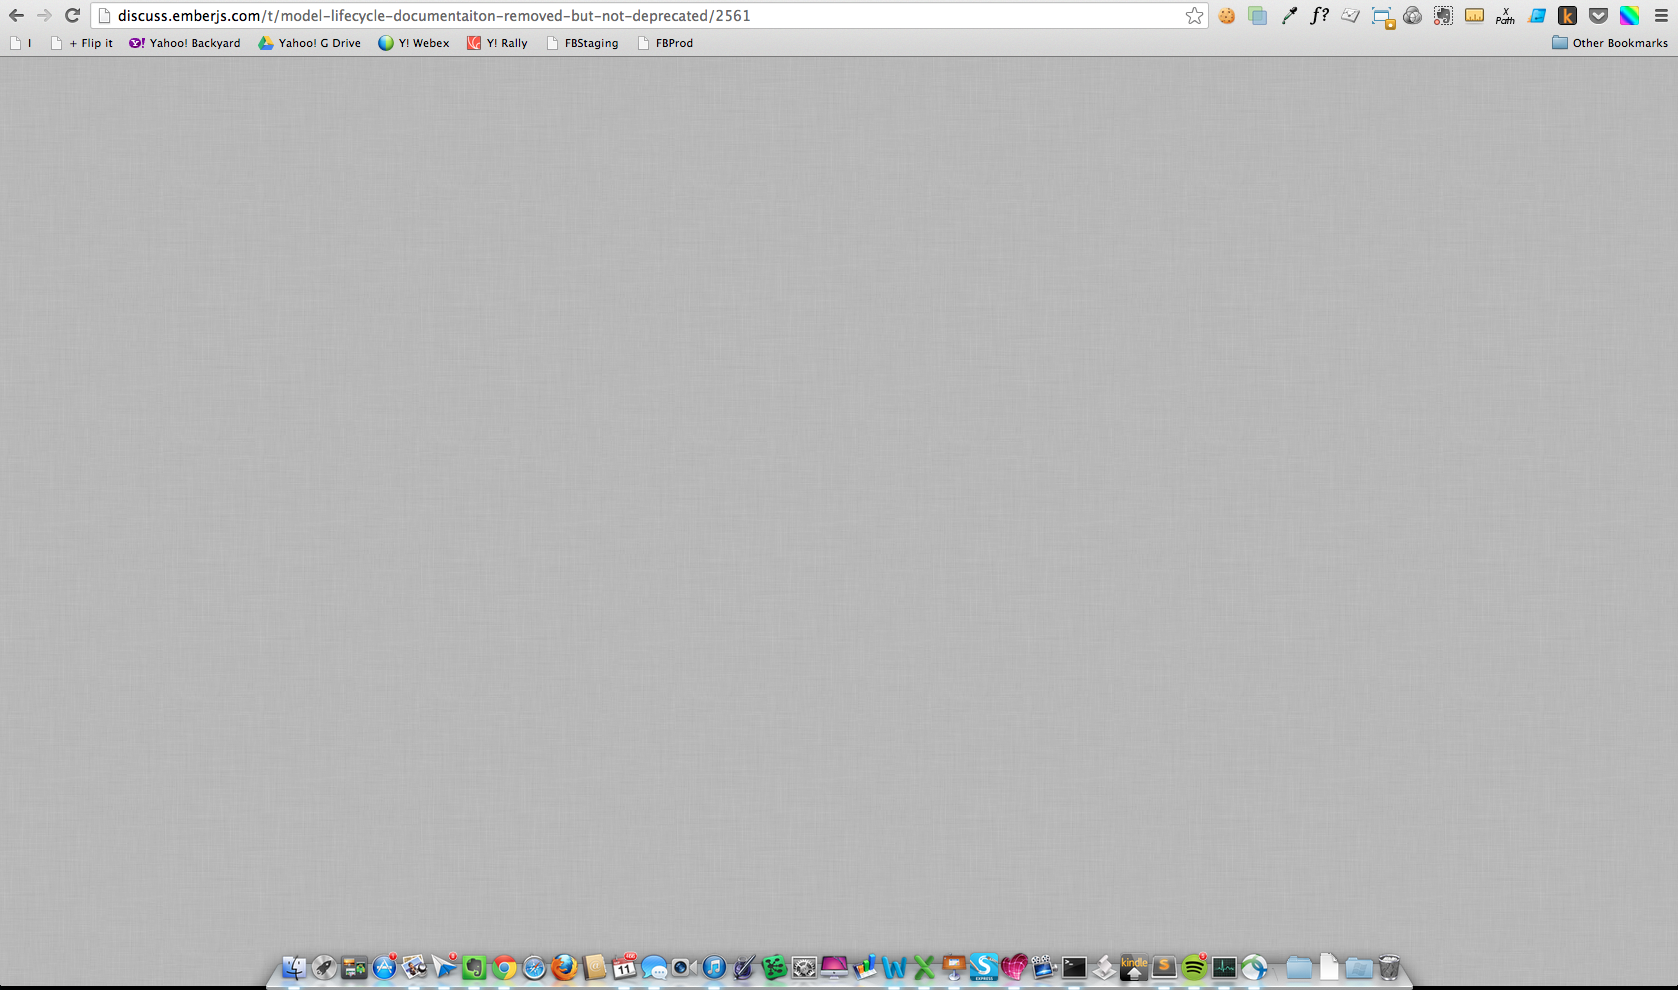 Fix Google Chrome black screen issues